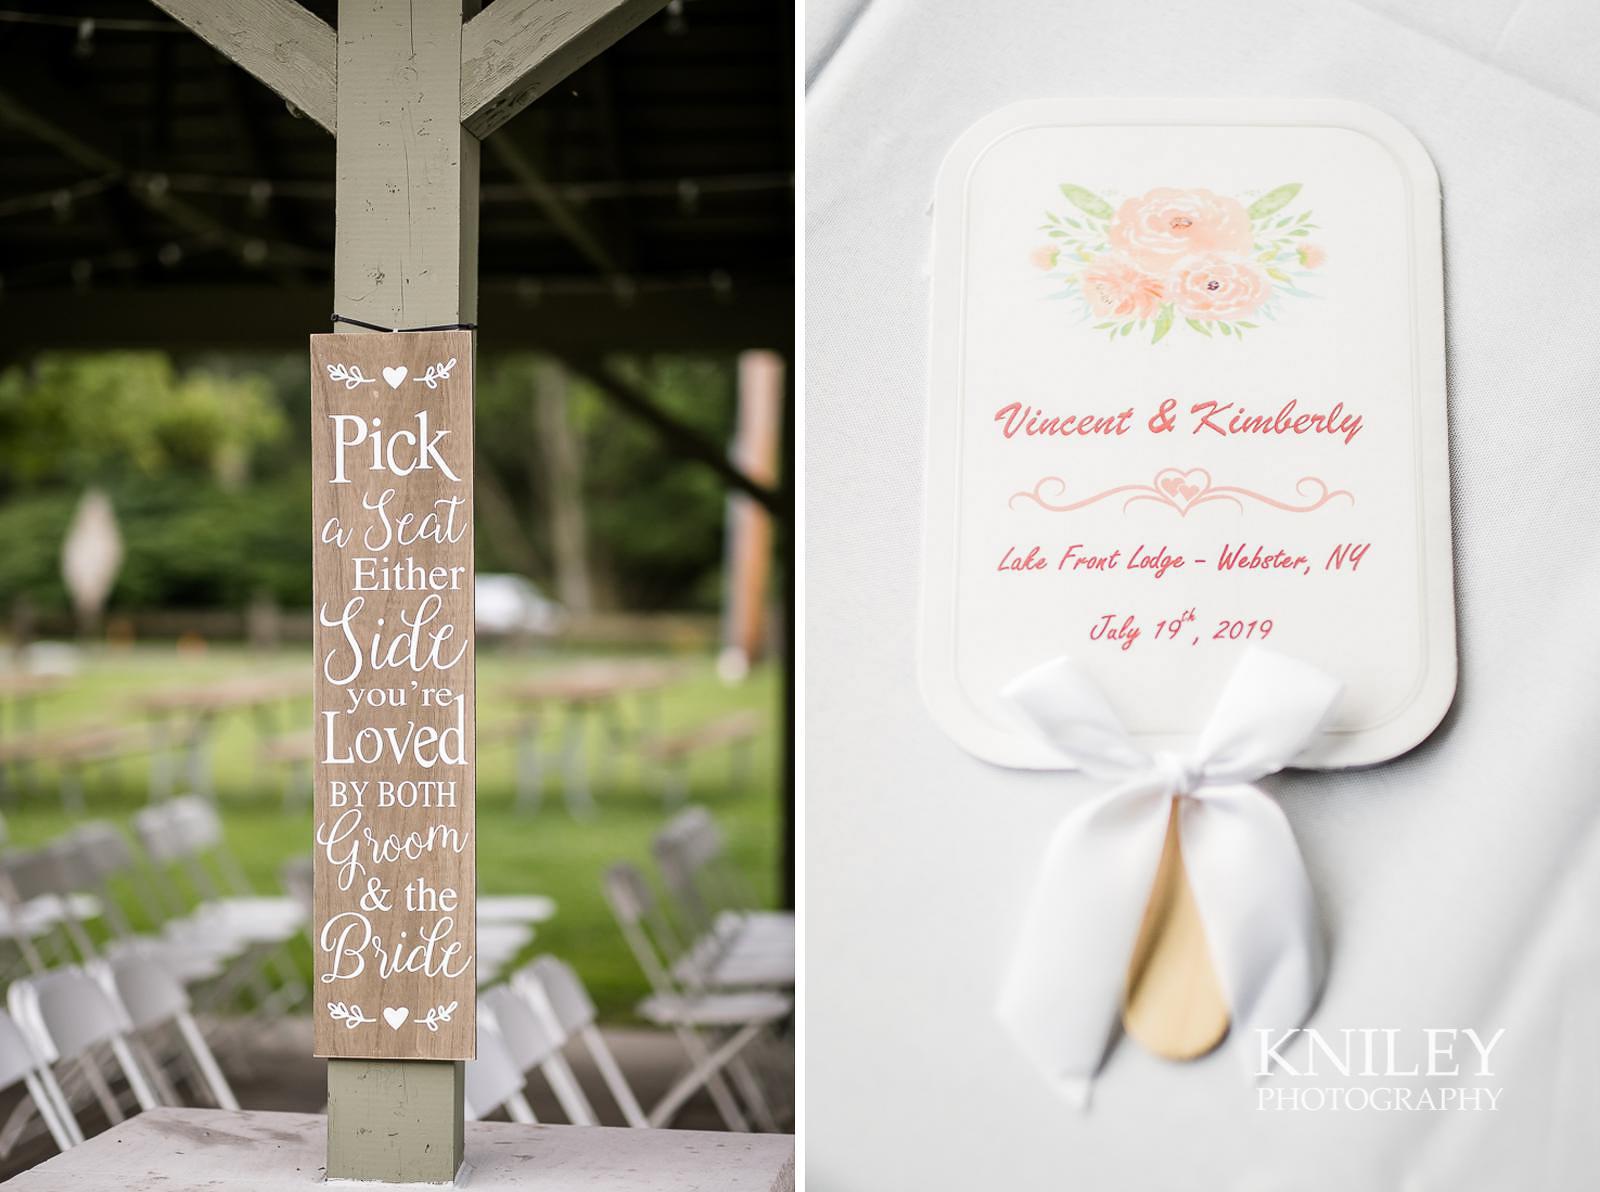 41-Lakefront-Lodge-Webster-NY-Wedding-Photography.jpg